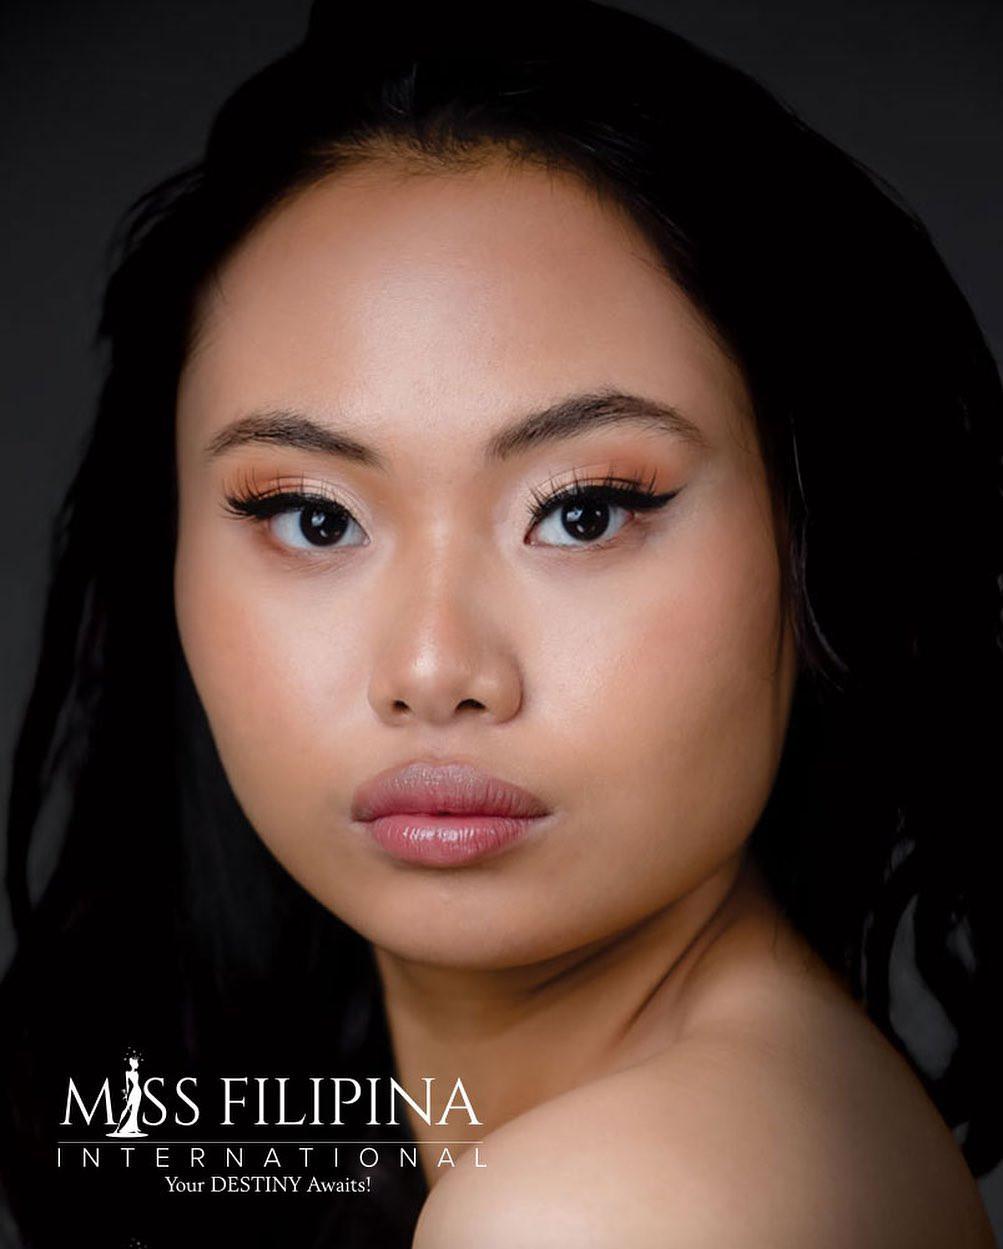 candidatas a miss filipina international 2021. final: 31 july. A523qg